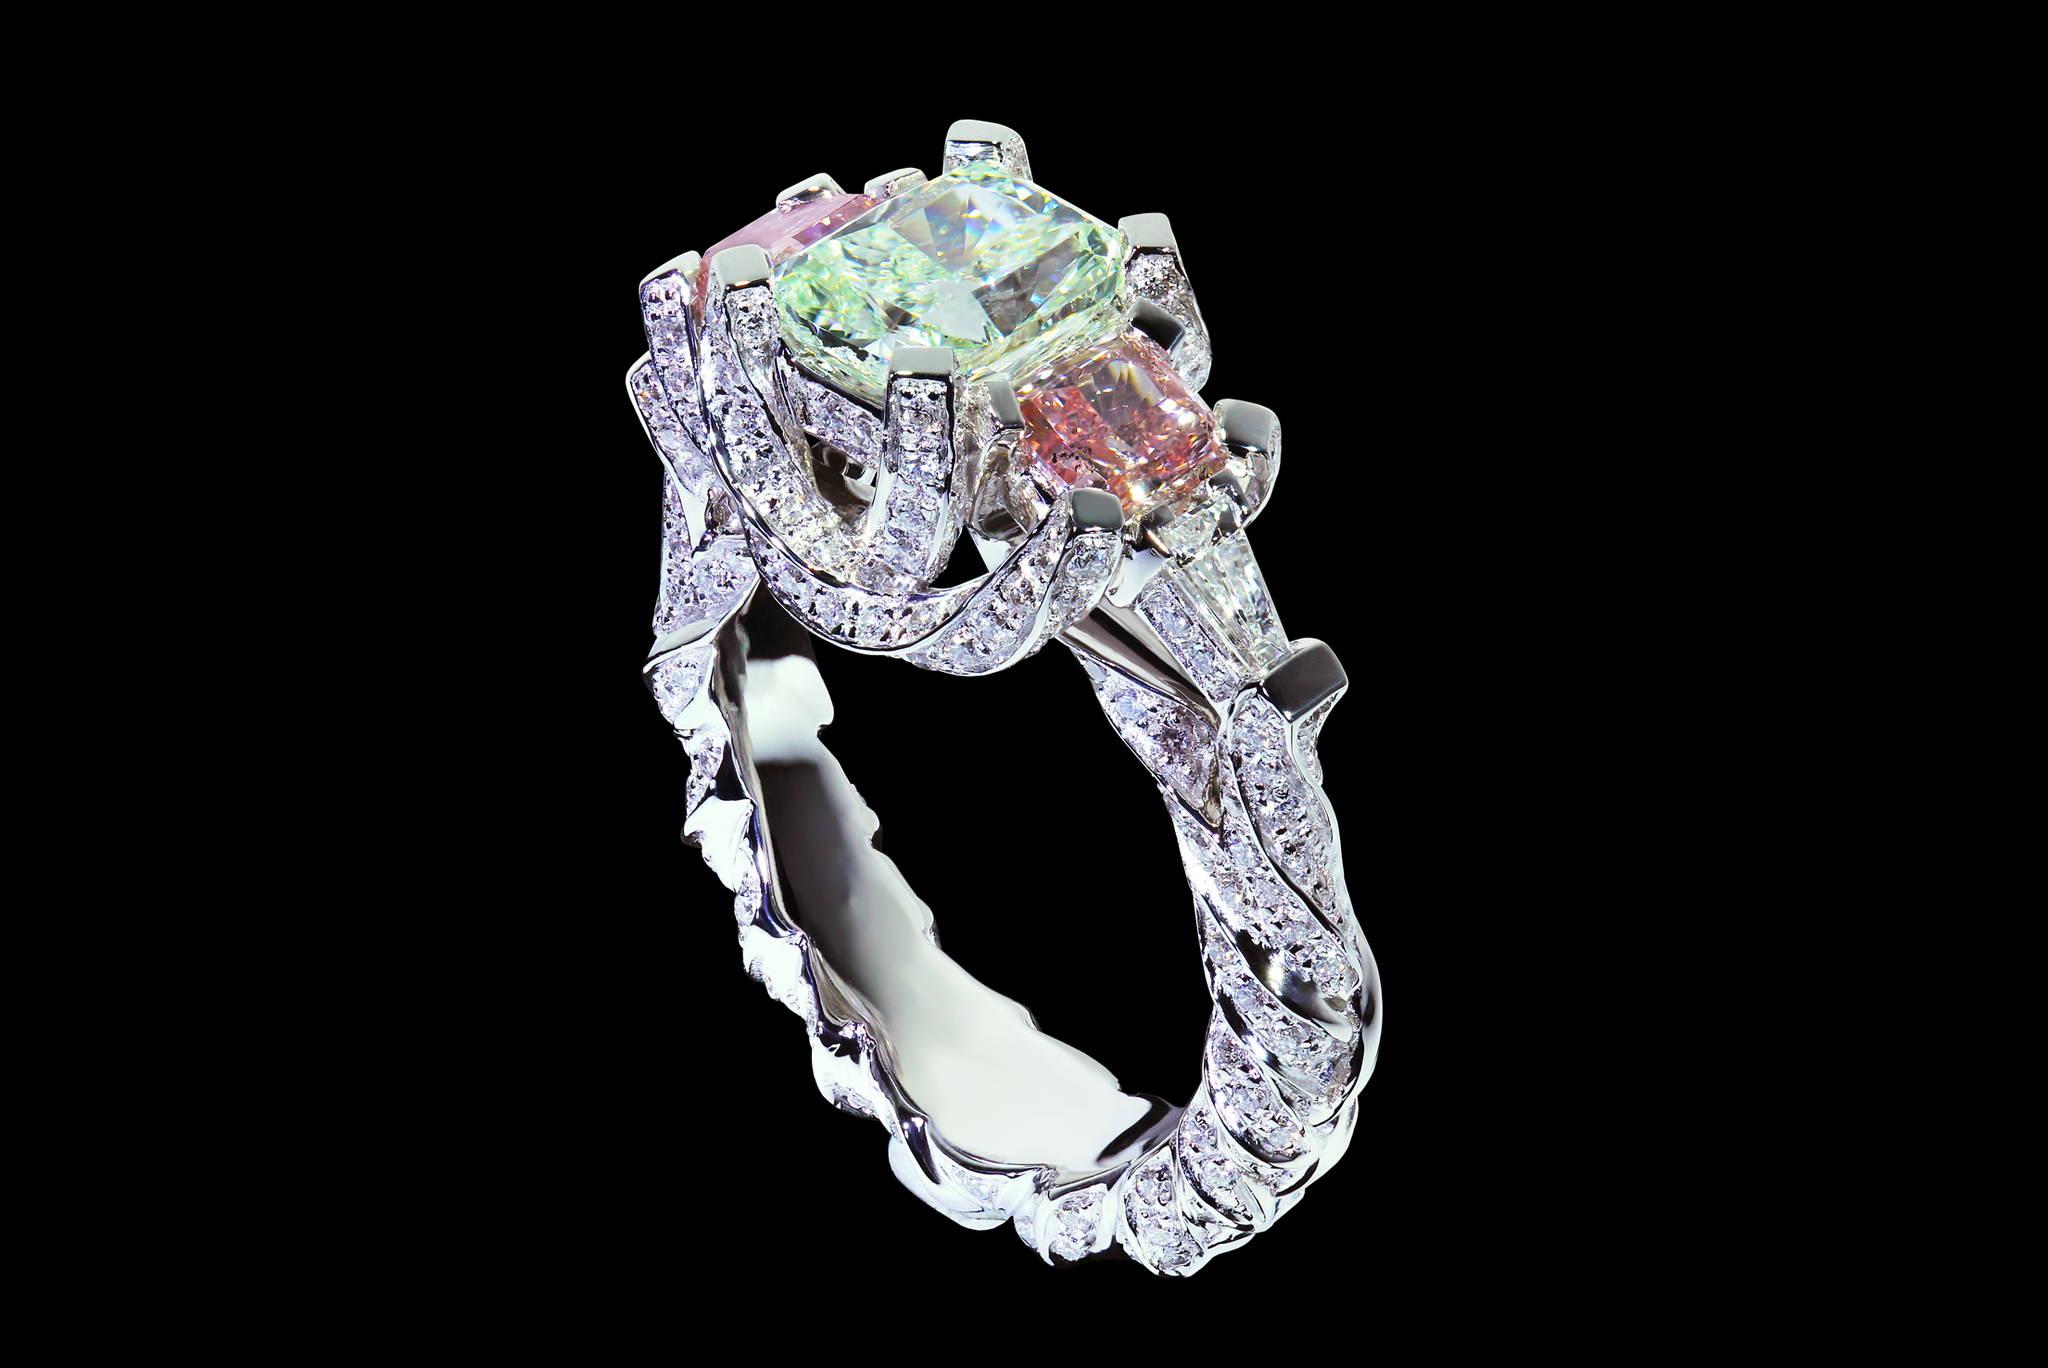 Braided Shank Diamond Ring 45 degrees view